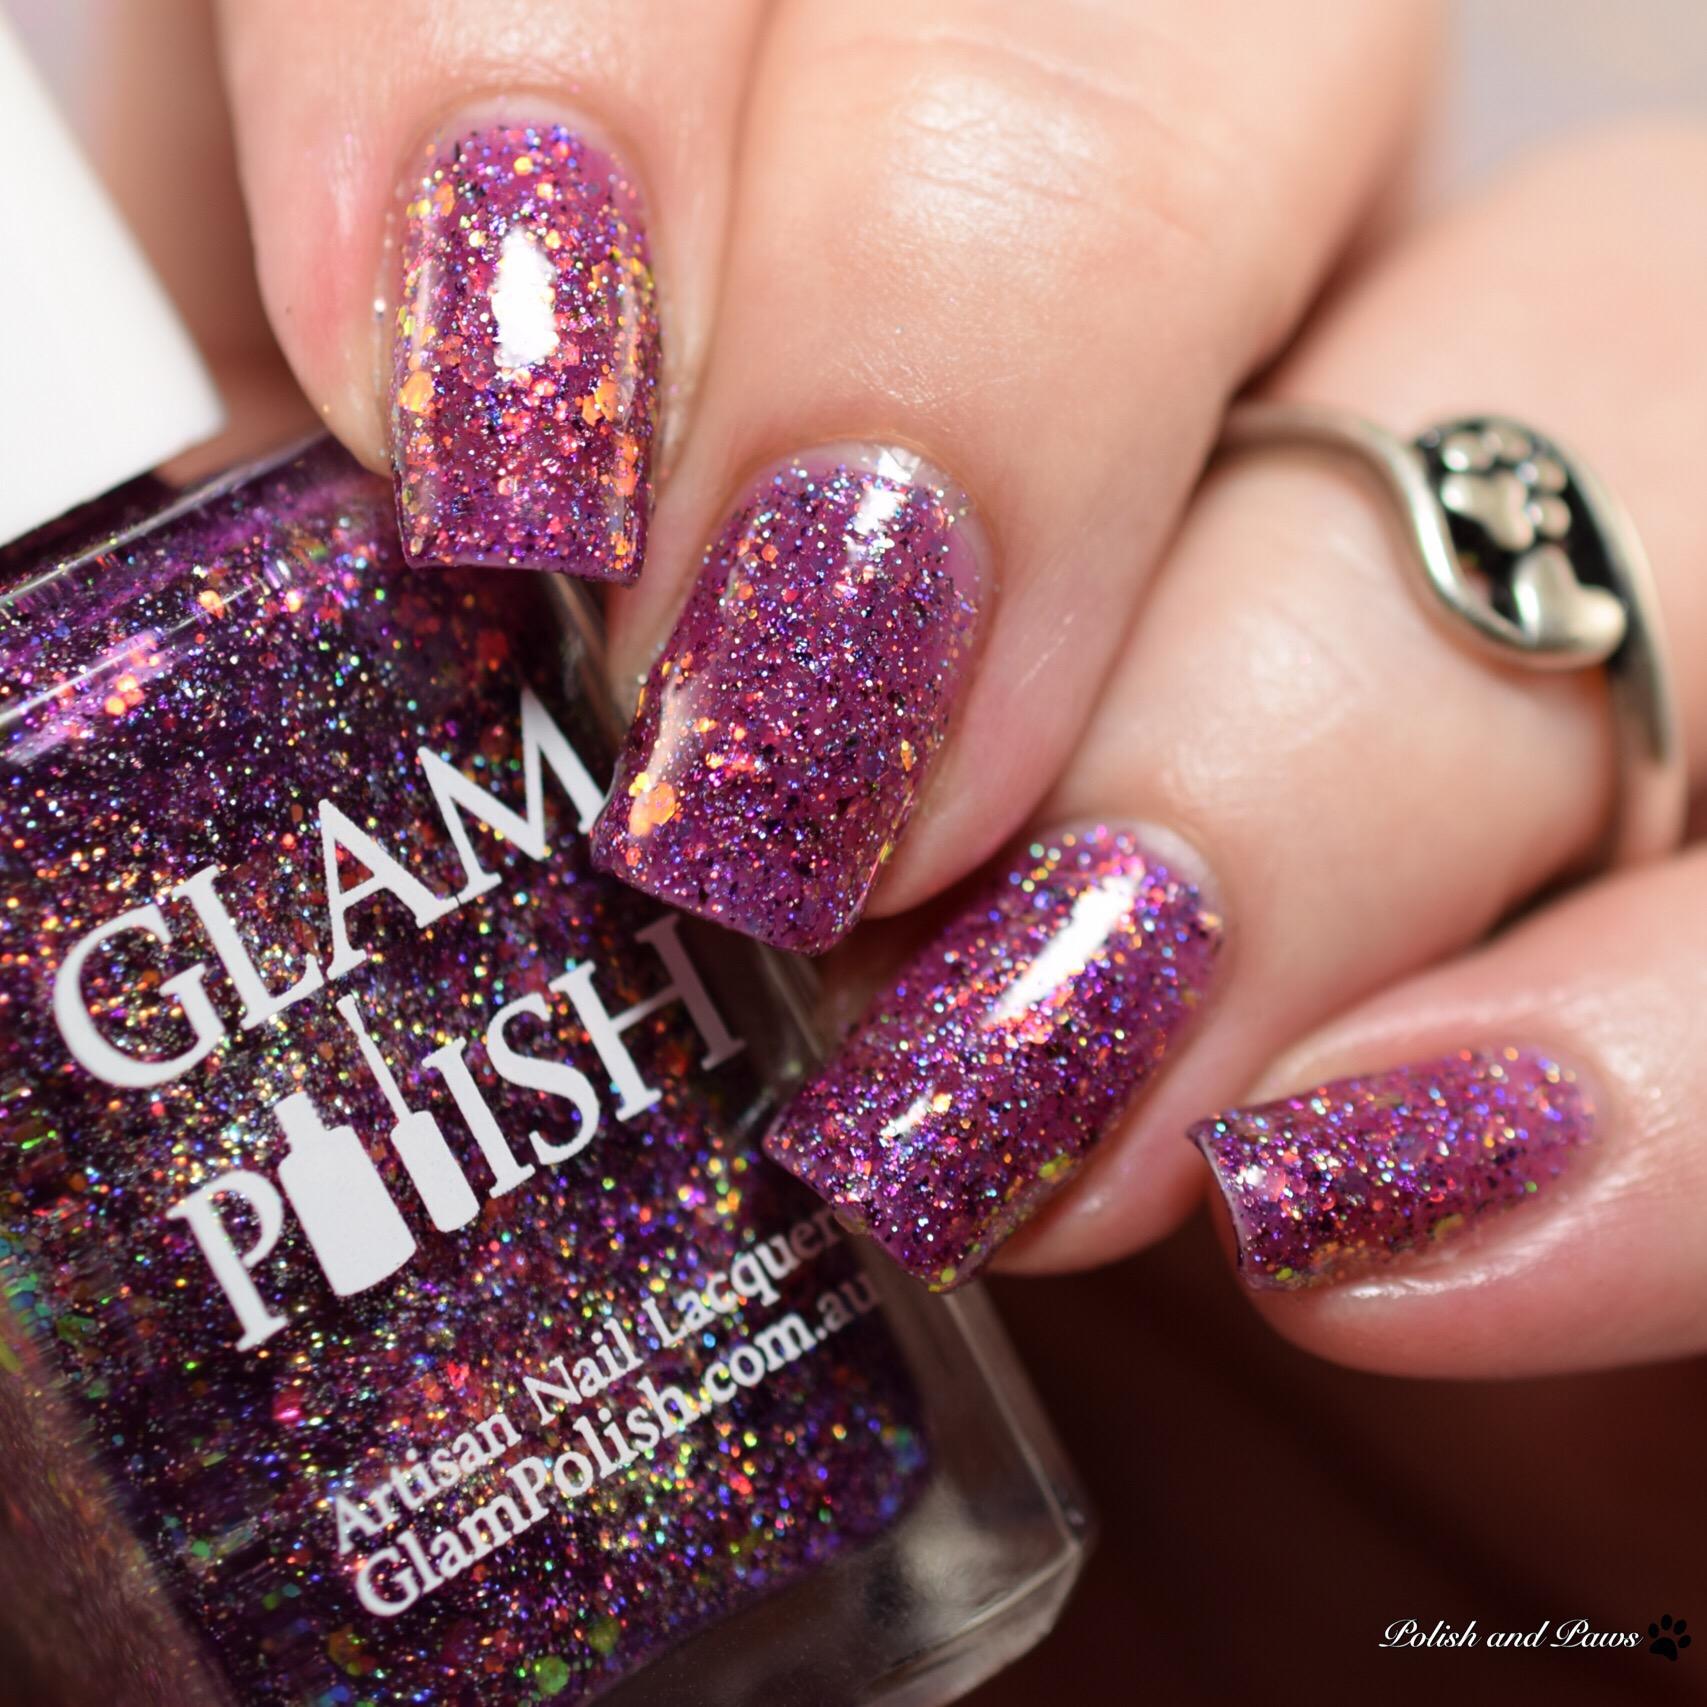 Glam Polish Case Full of Magical Creatures